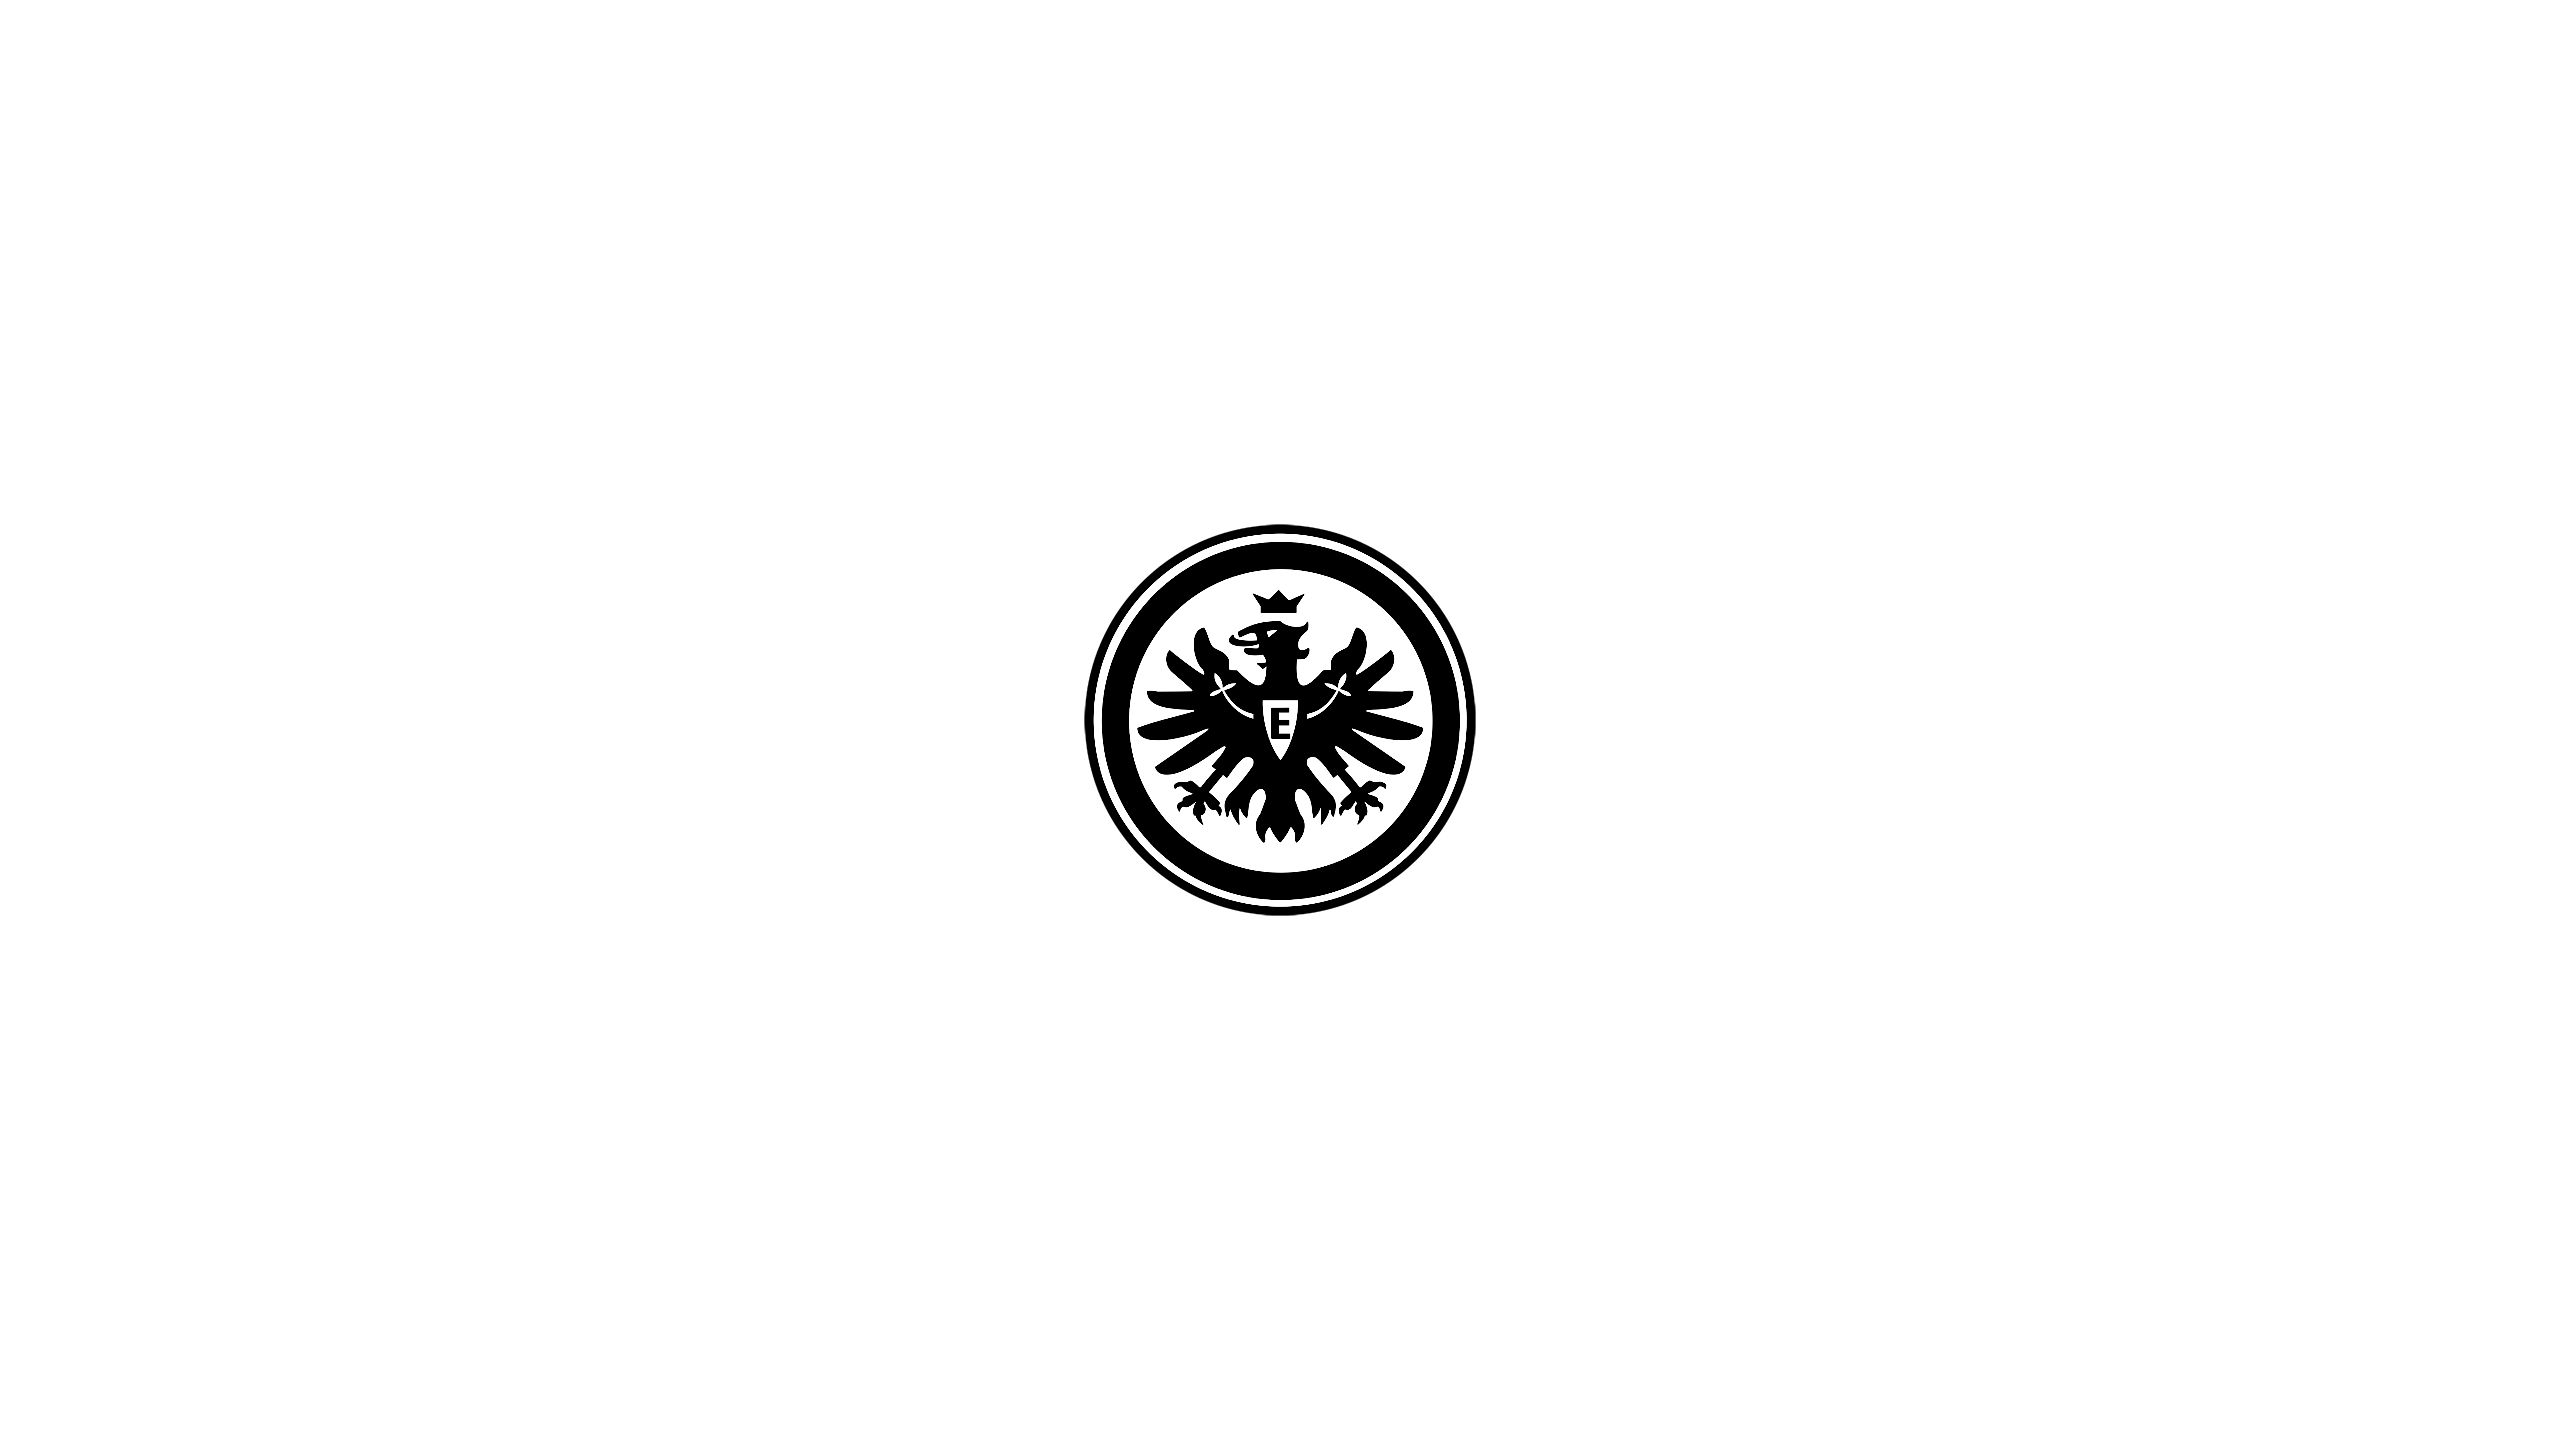 Eintracht Frankfurt FC (Alt)